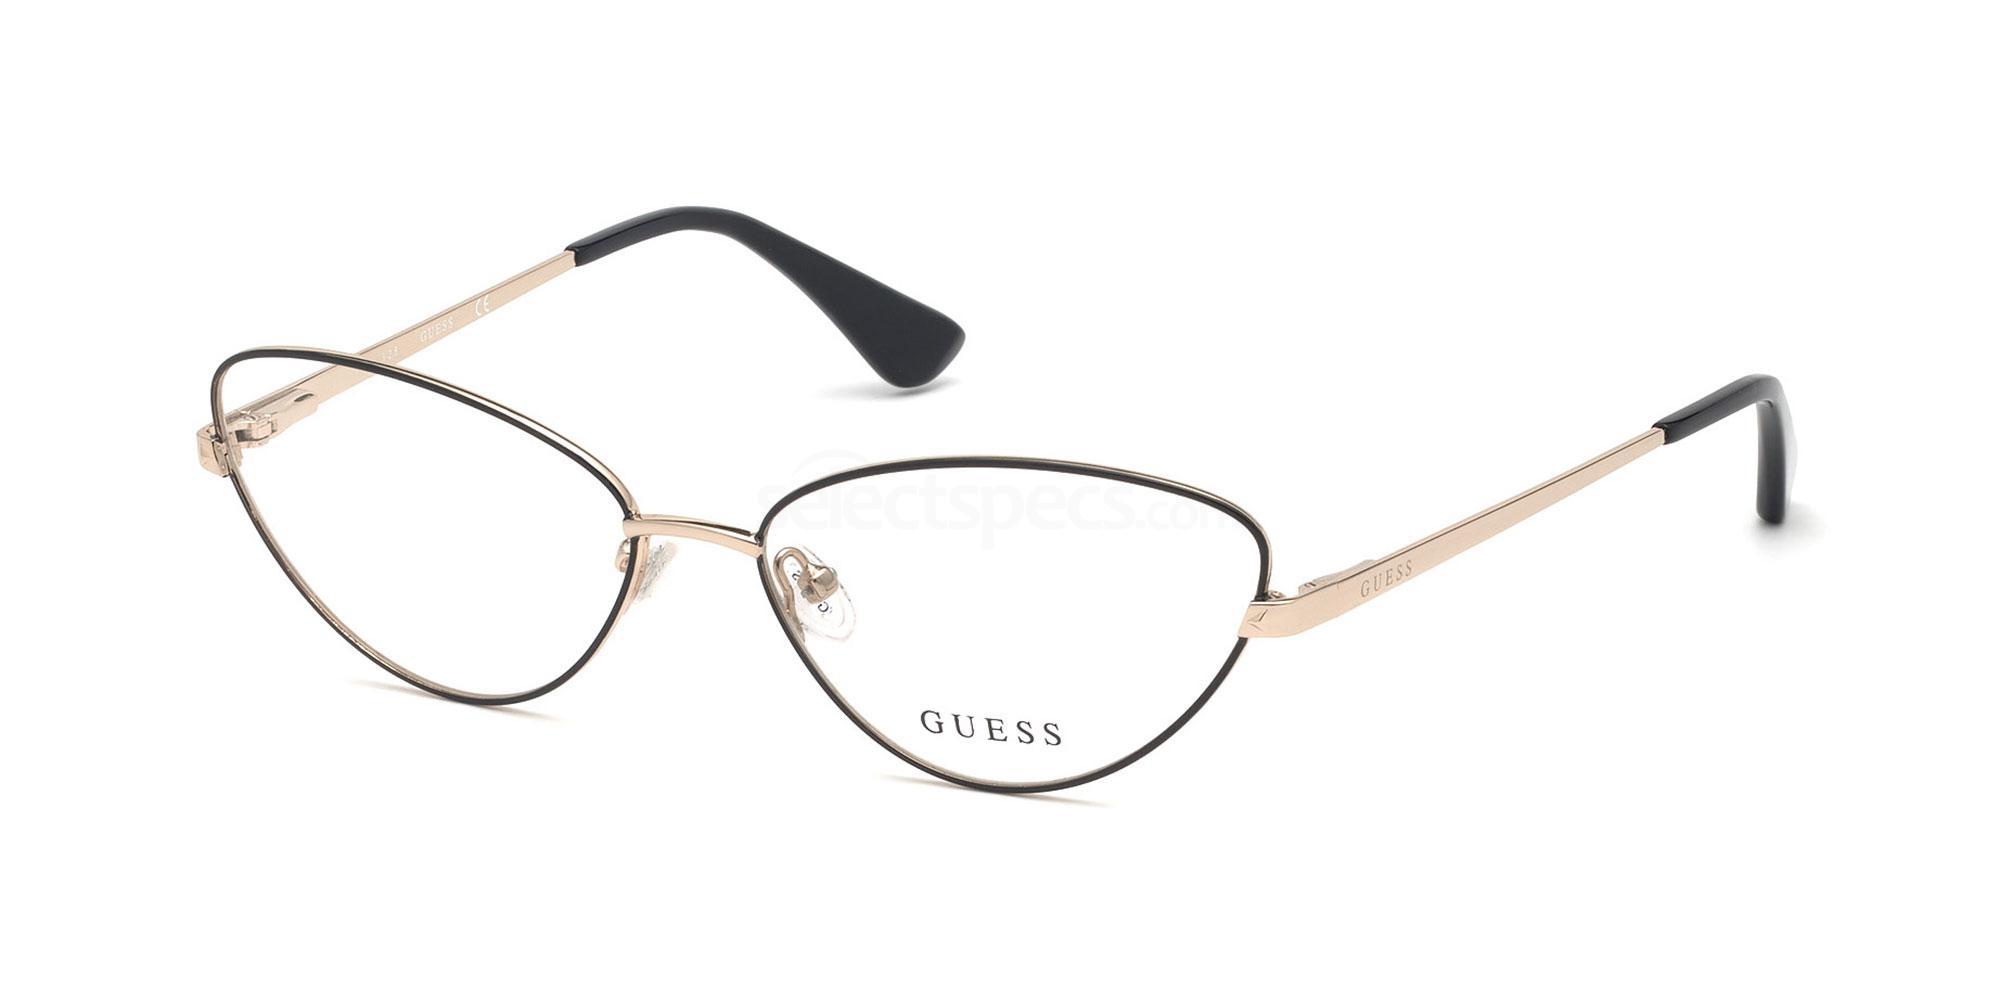 005 GU2727 Glasses, Guess